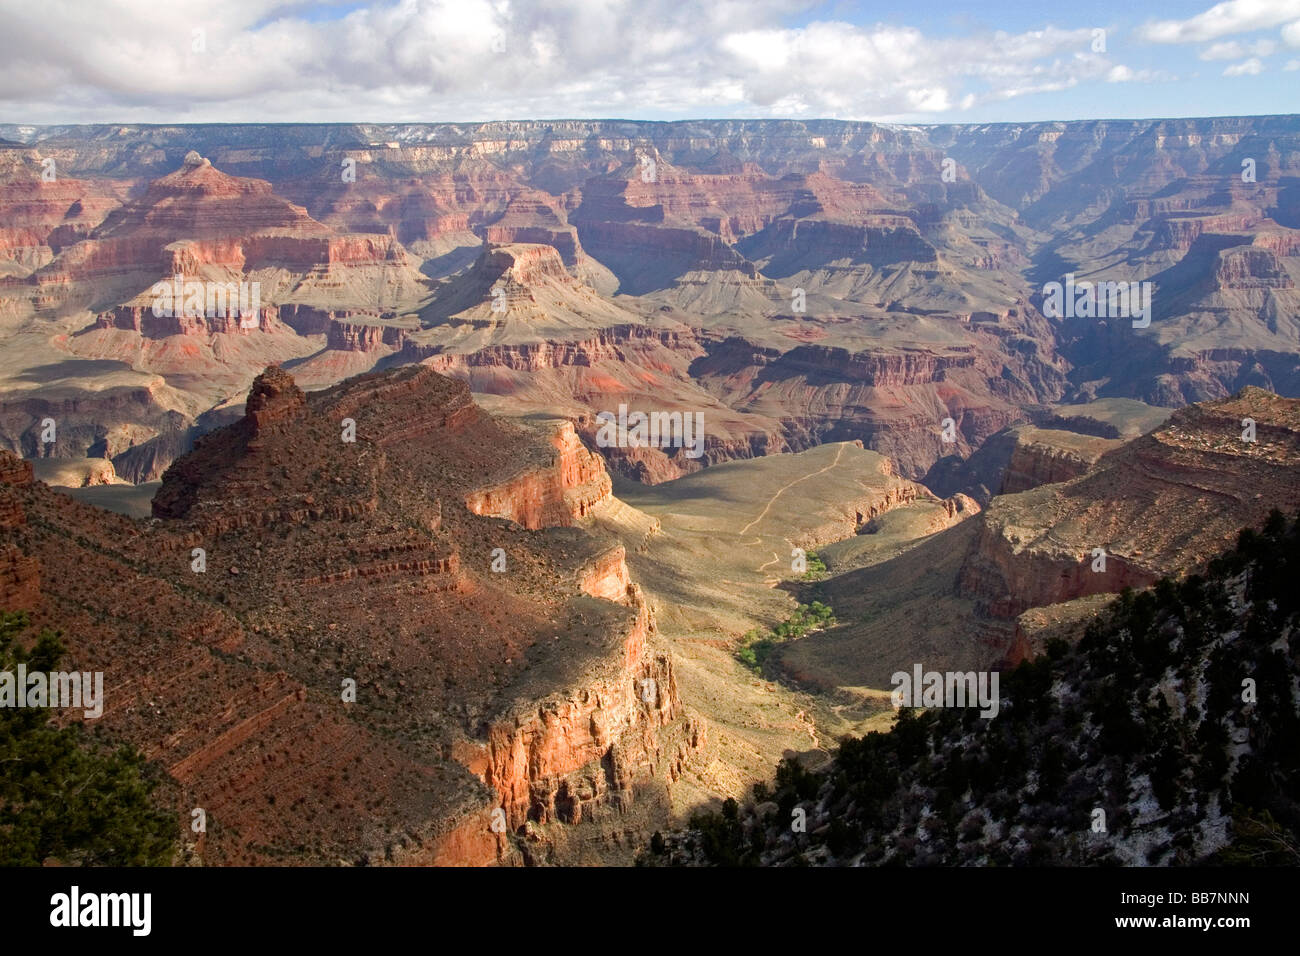 South Rim view of the Grand Canyon Arizona USA - Stock Image